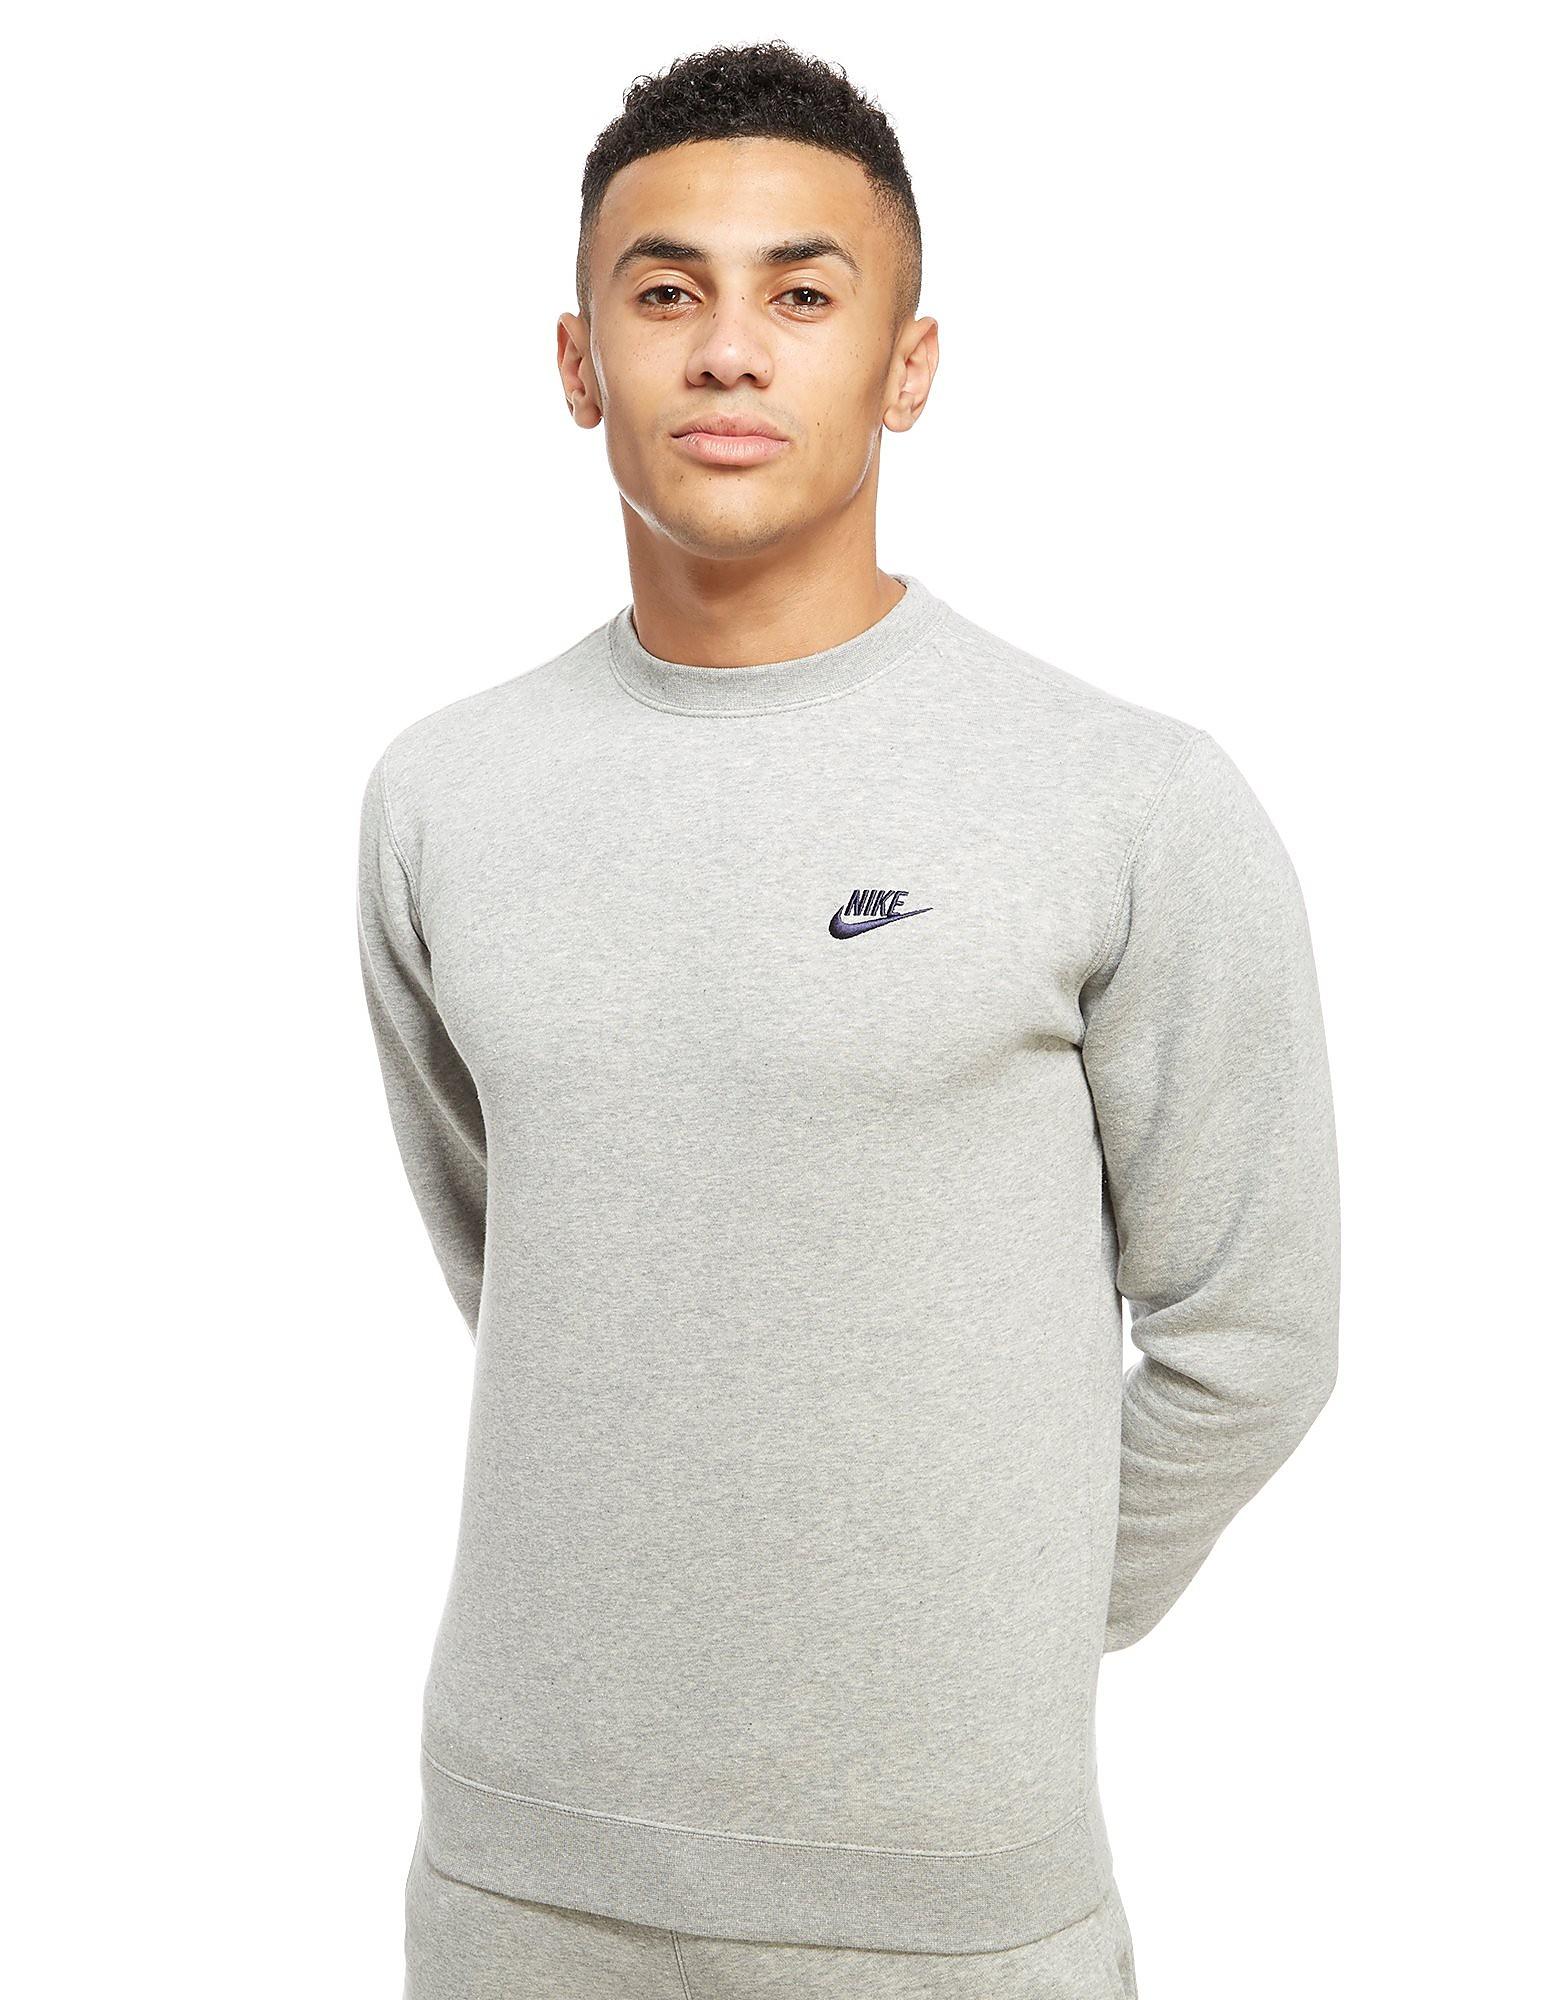 Nike Foundation Sweatshirt